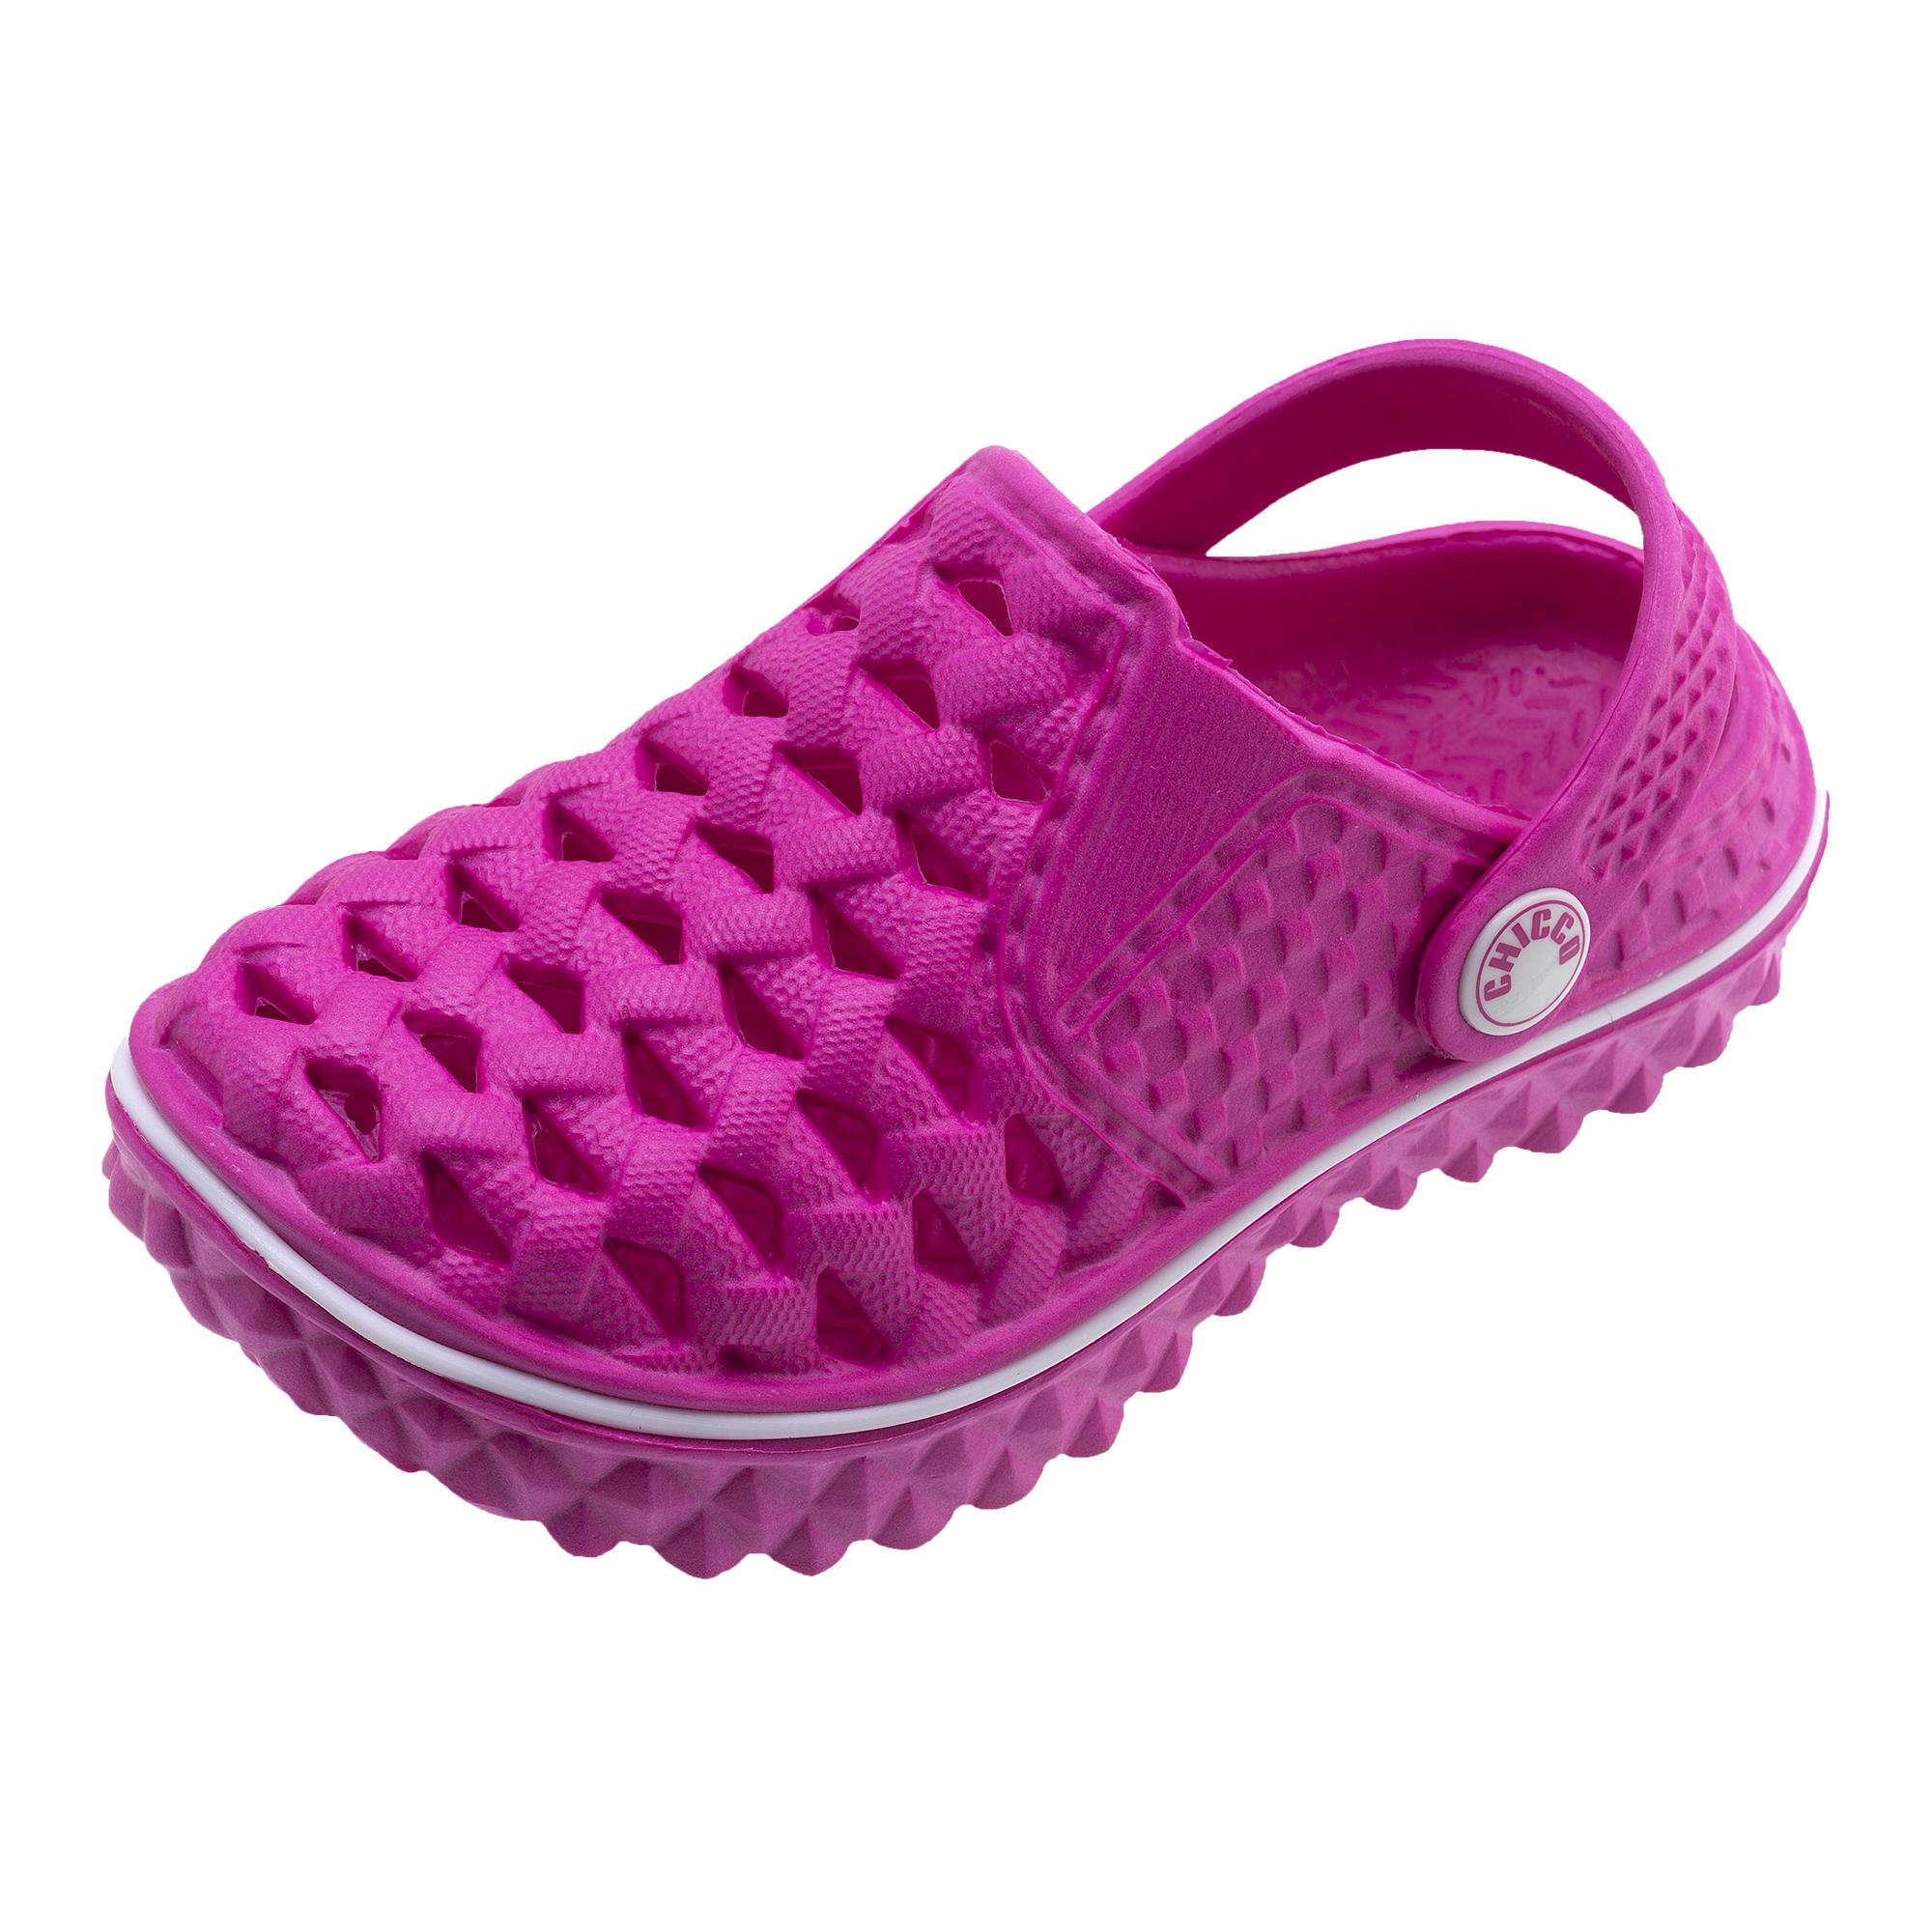 Papuci Copii Chicco Mango, Forma Libelula, Roz, 61751 imagine